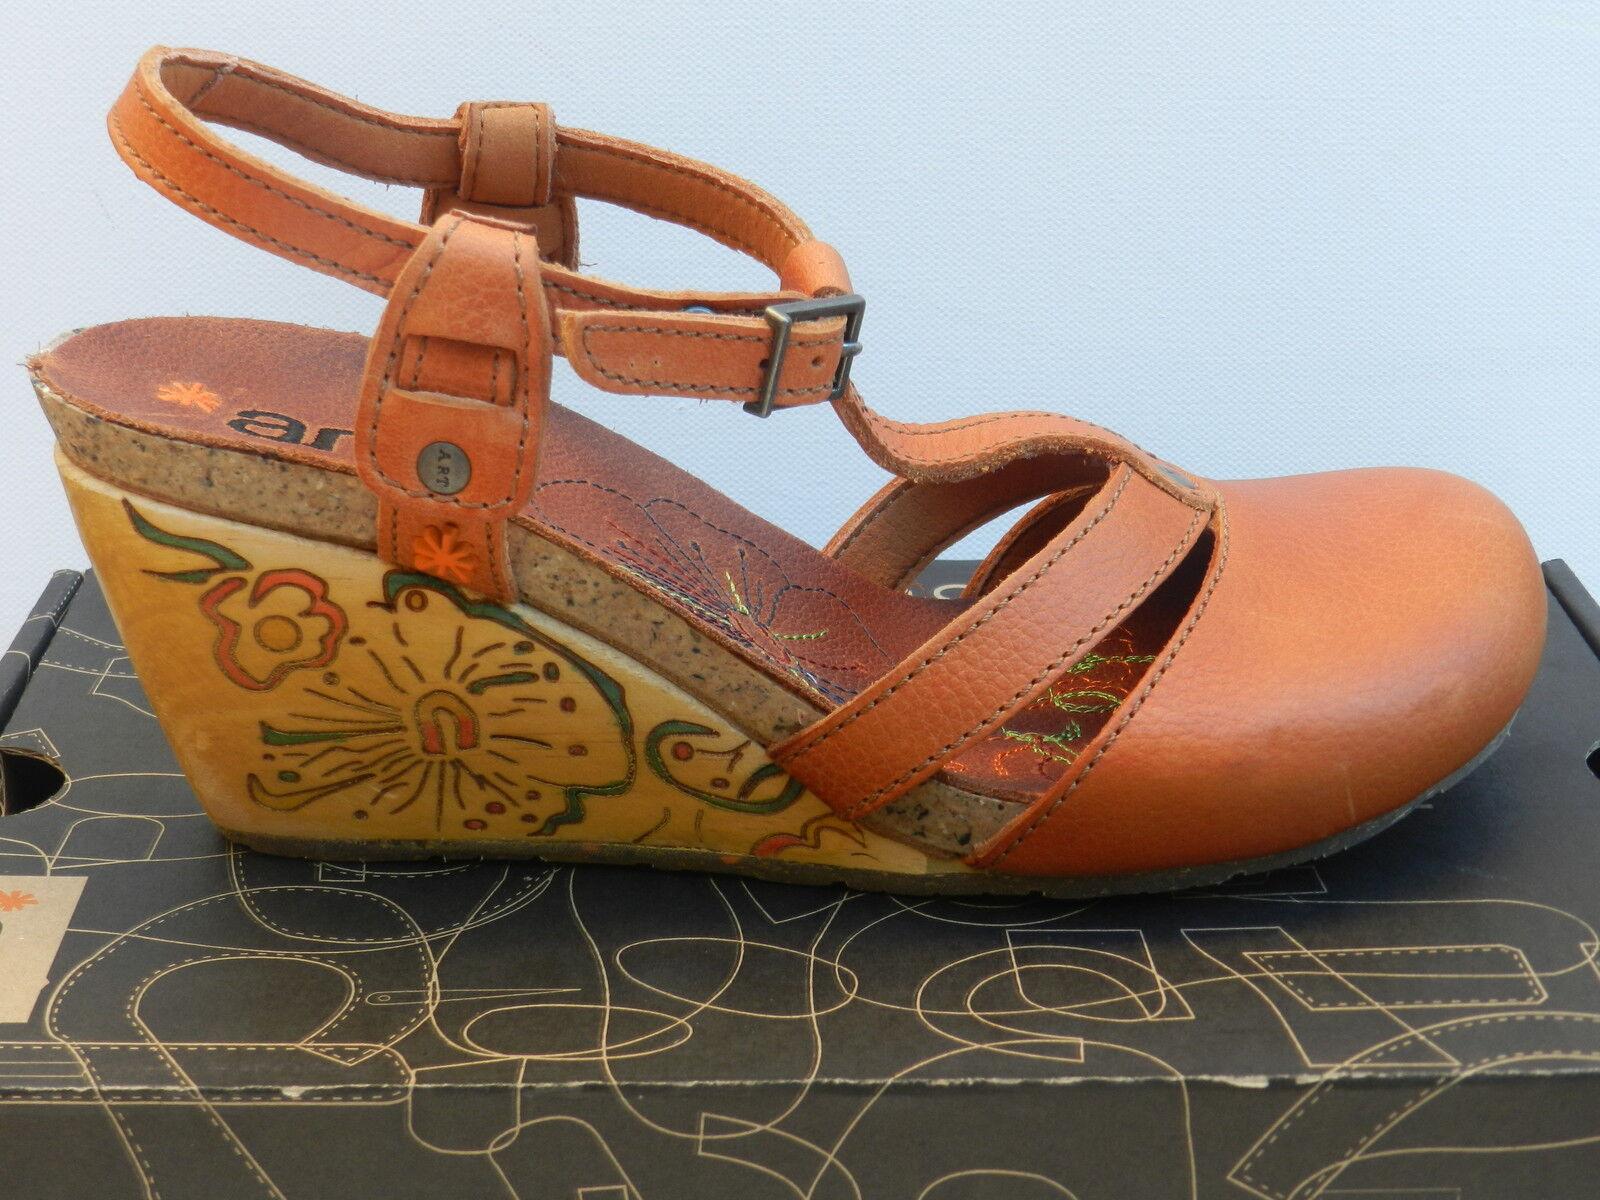 Art Menorca 292 Sandales shoes Femme 41 Escarpins 0292 UK8 Ballerines Neuf